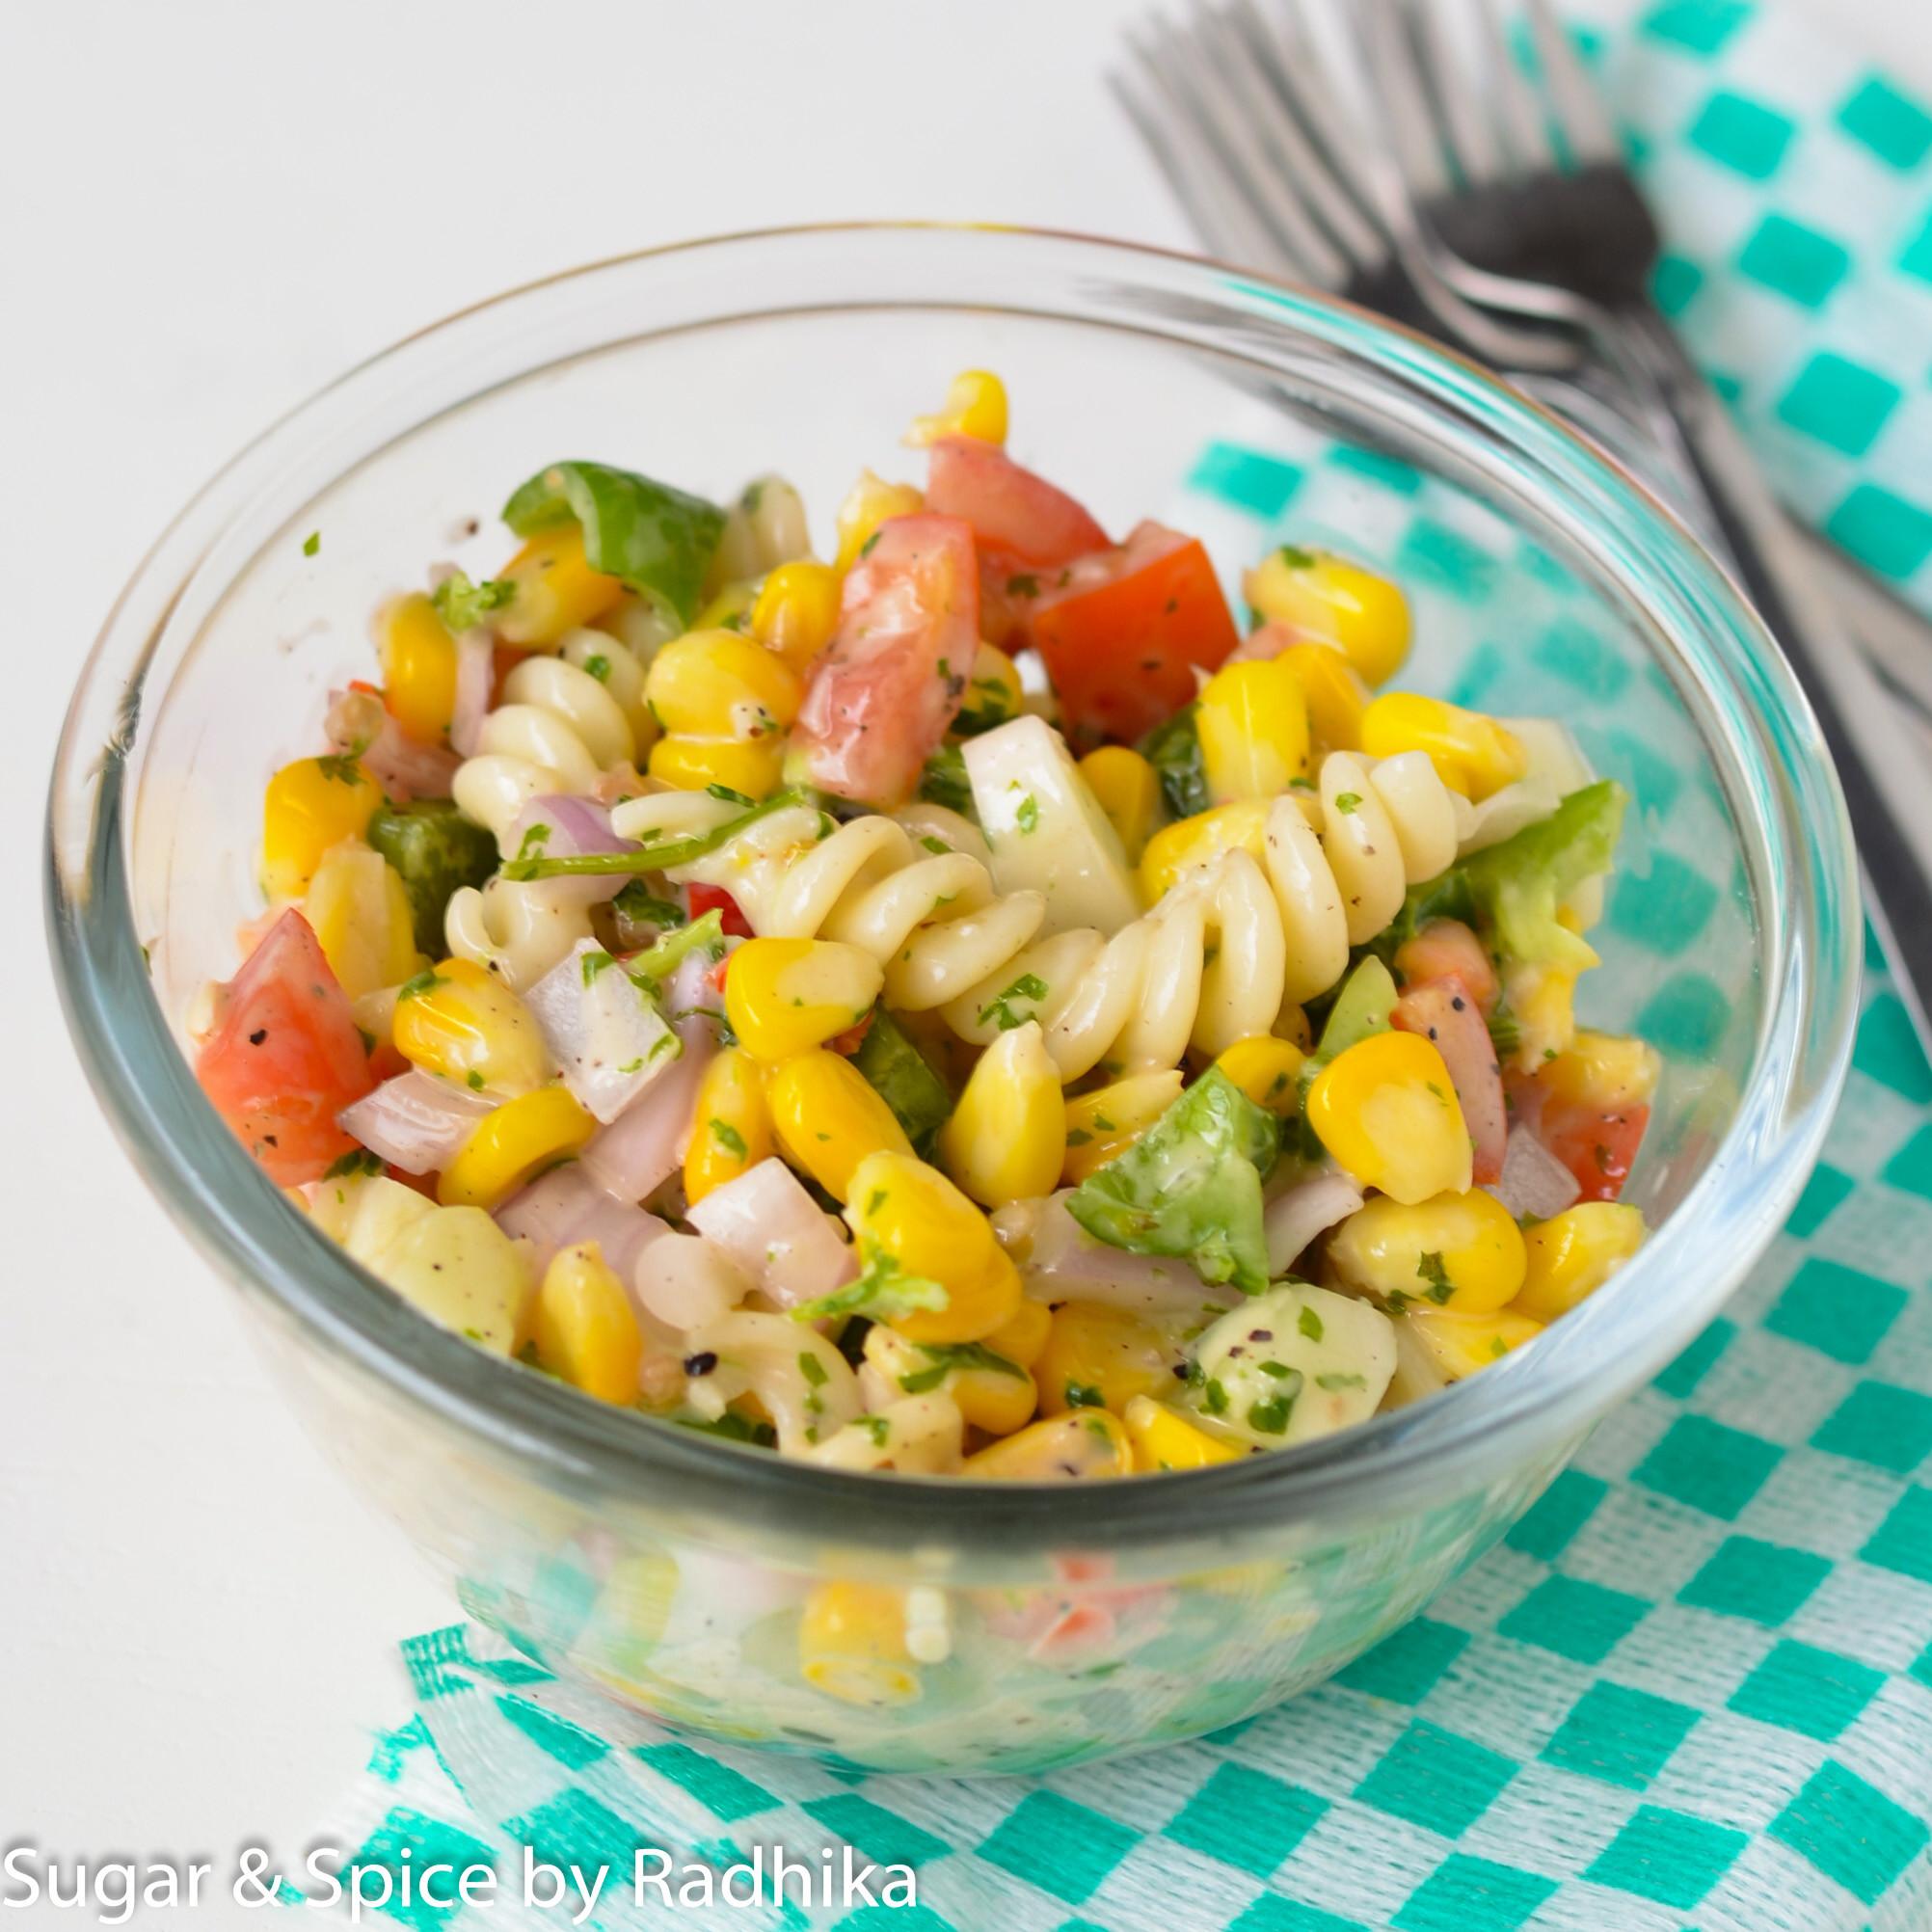 Corn Pasta Salad  Sweet Corn and Pasta Salad Sugar & Spice by Radhika